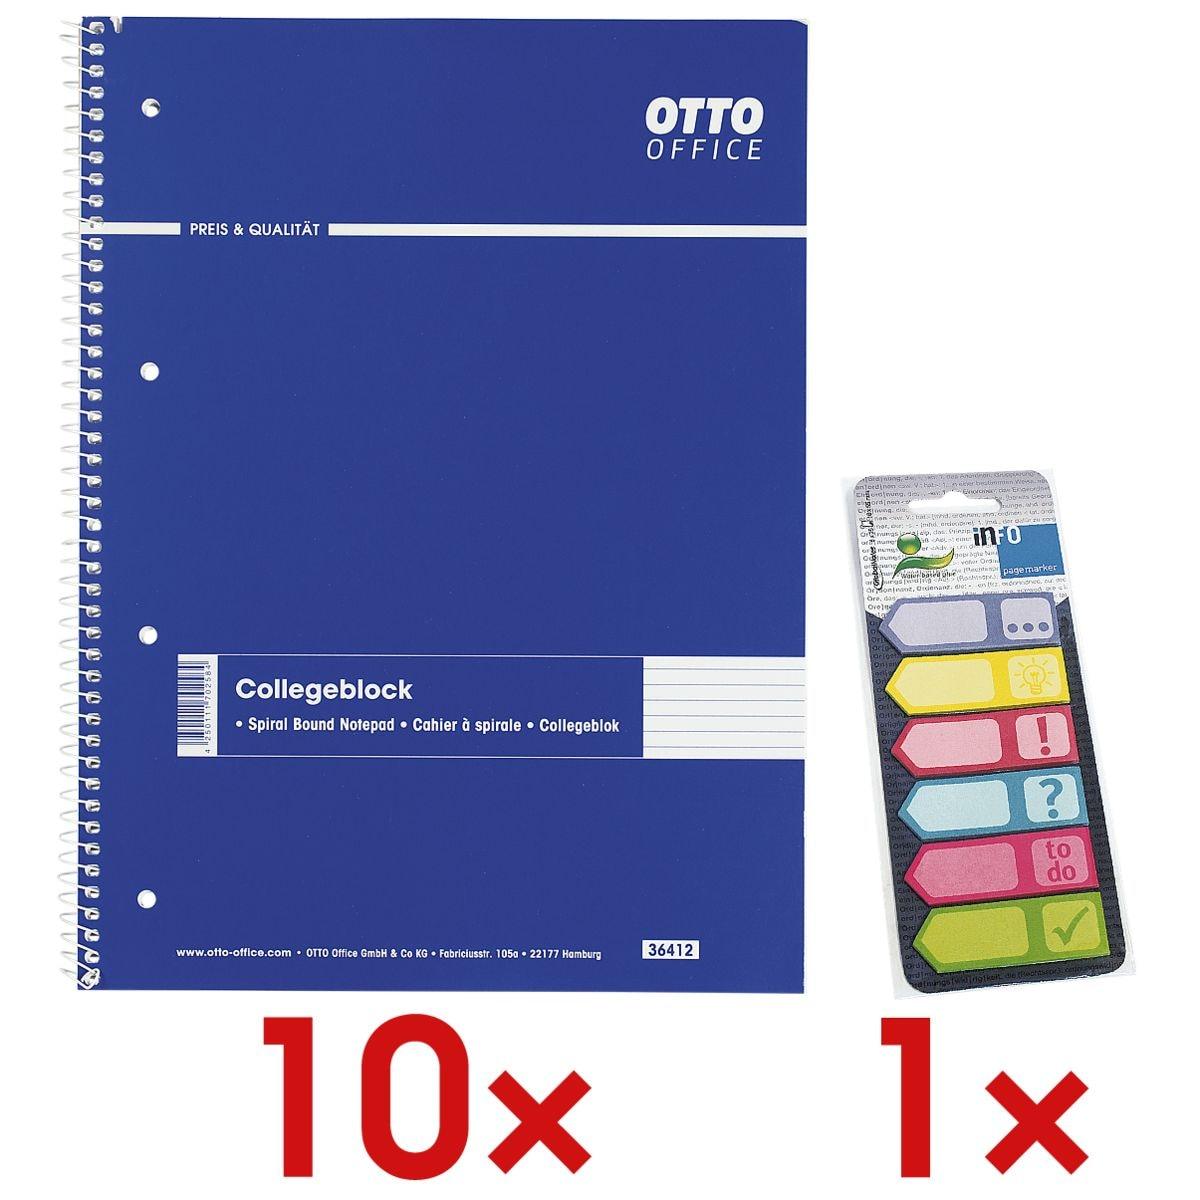 10x OTTO Office Collegeblock A4 liniert, 80 Blatt inkl. Haftmarker 150 Blatt gesamt, Papier, 50 x 18 mm